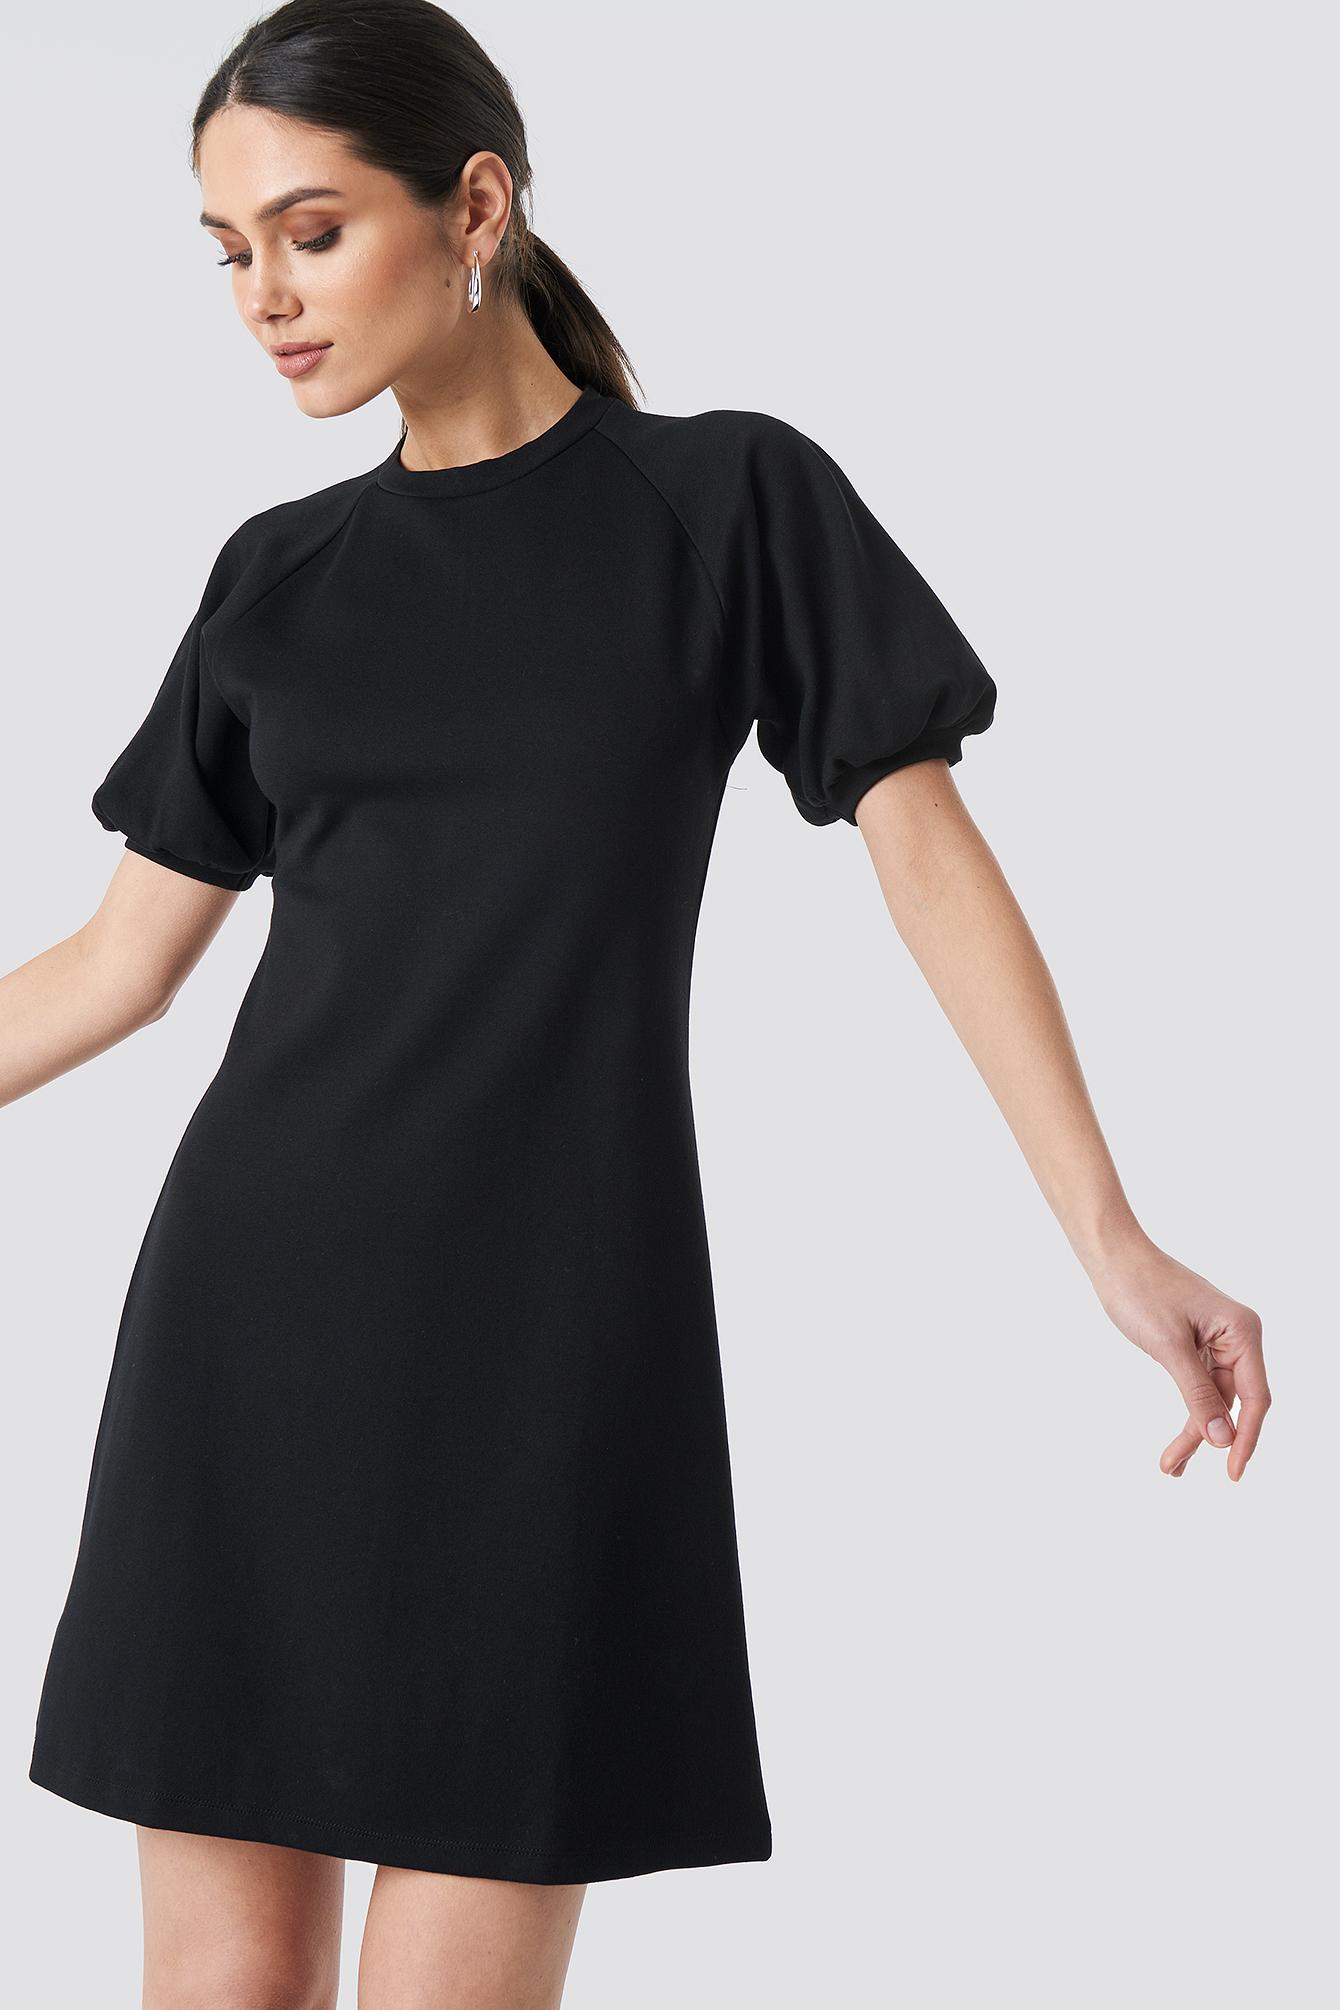 Balloon Sleeve Knitted Dress NA-KD.COM